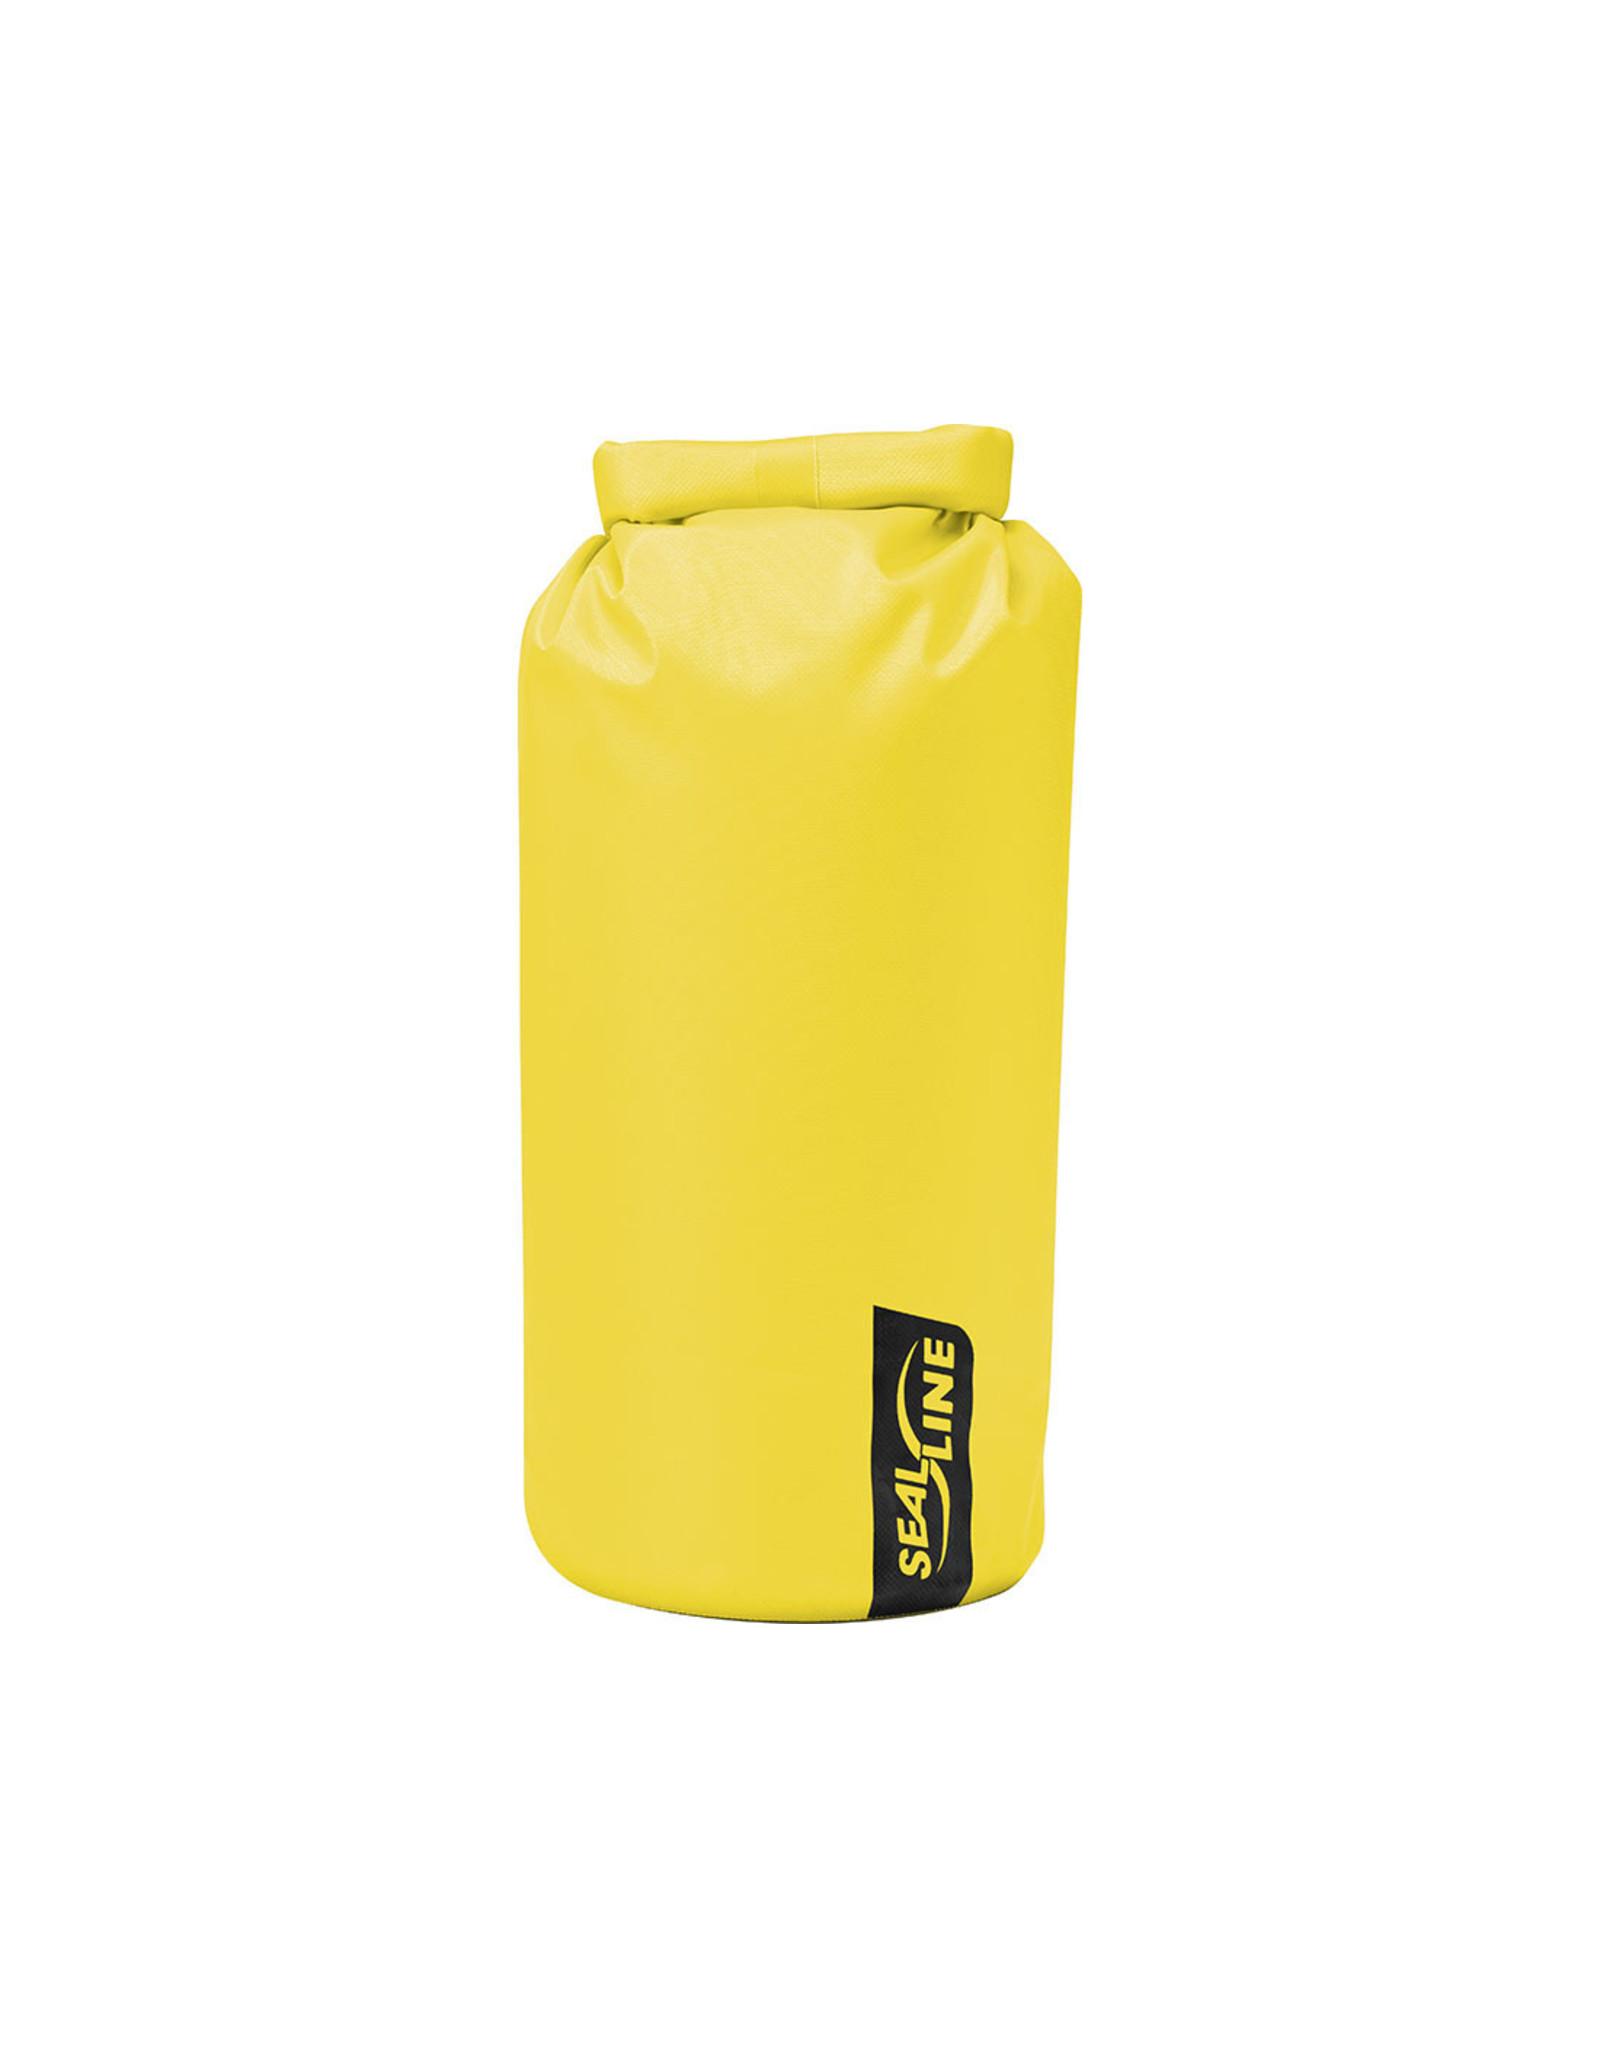 SealLine SealLine 40L Baja Dry Bag S19